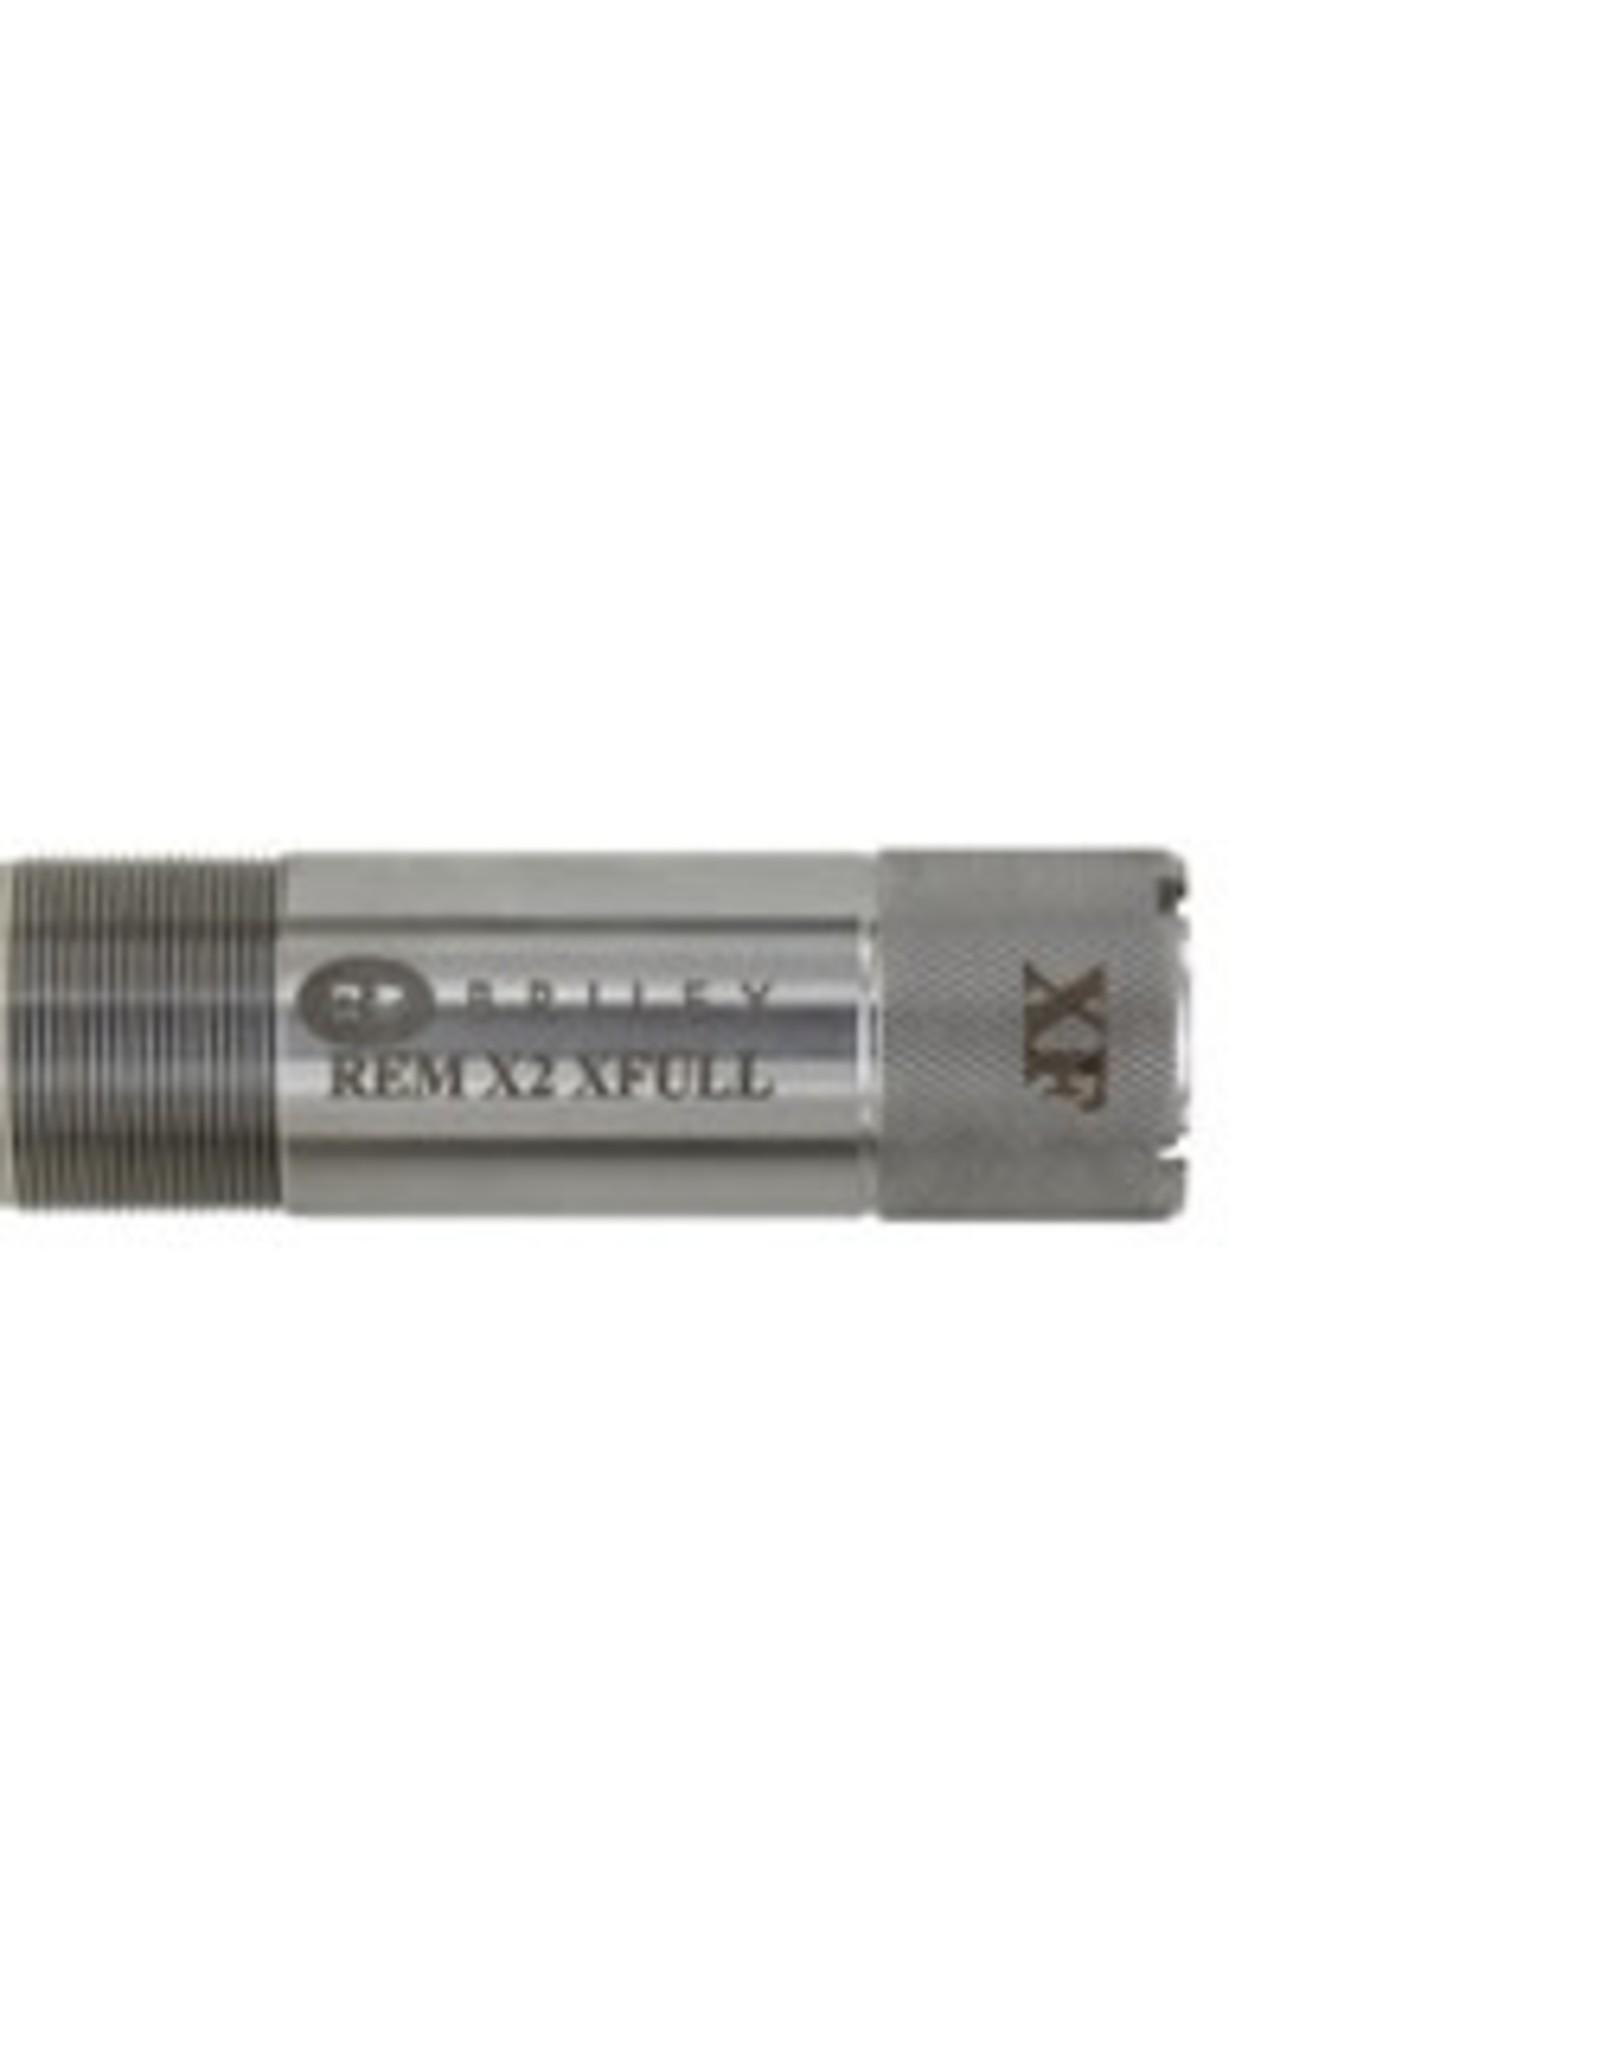 Remington 20ga Ext SS - Improved Cylinder